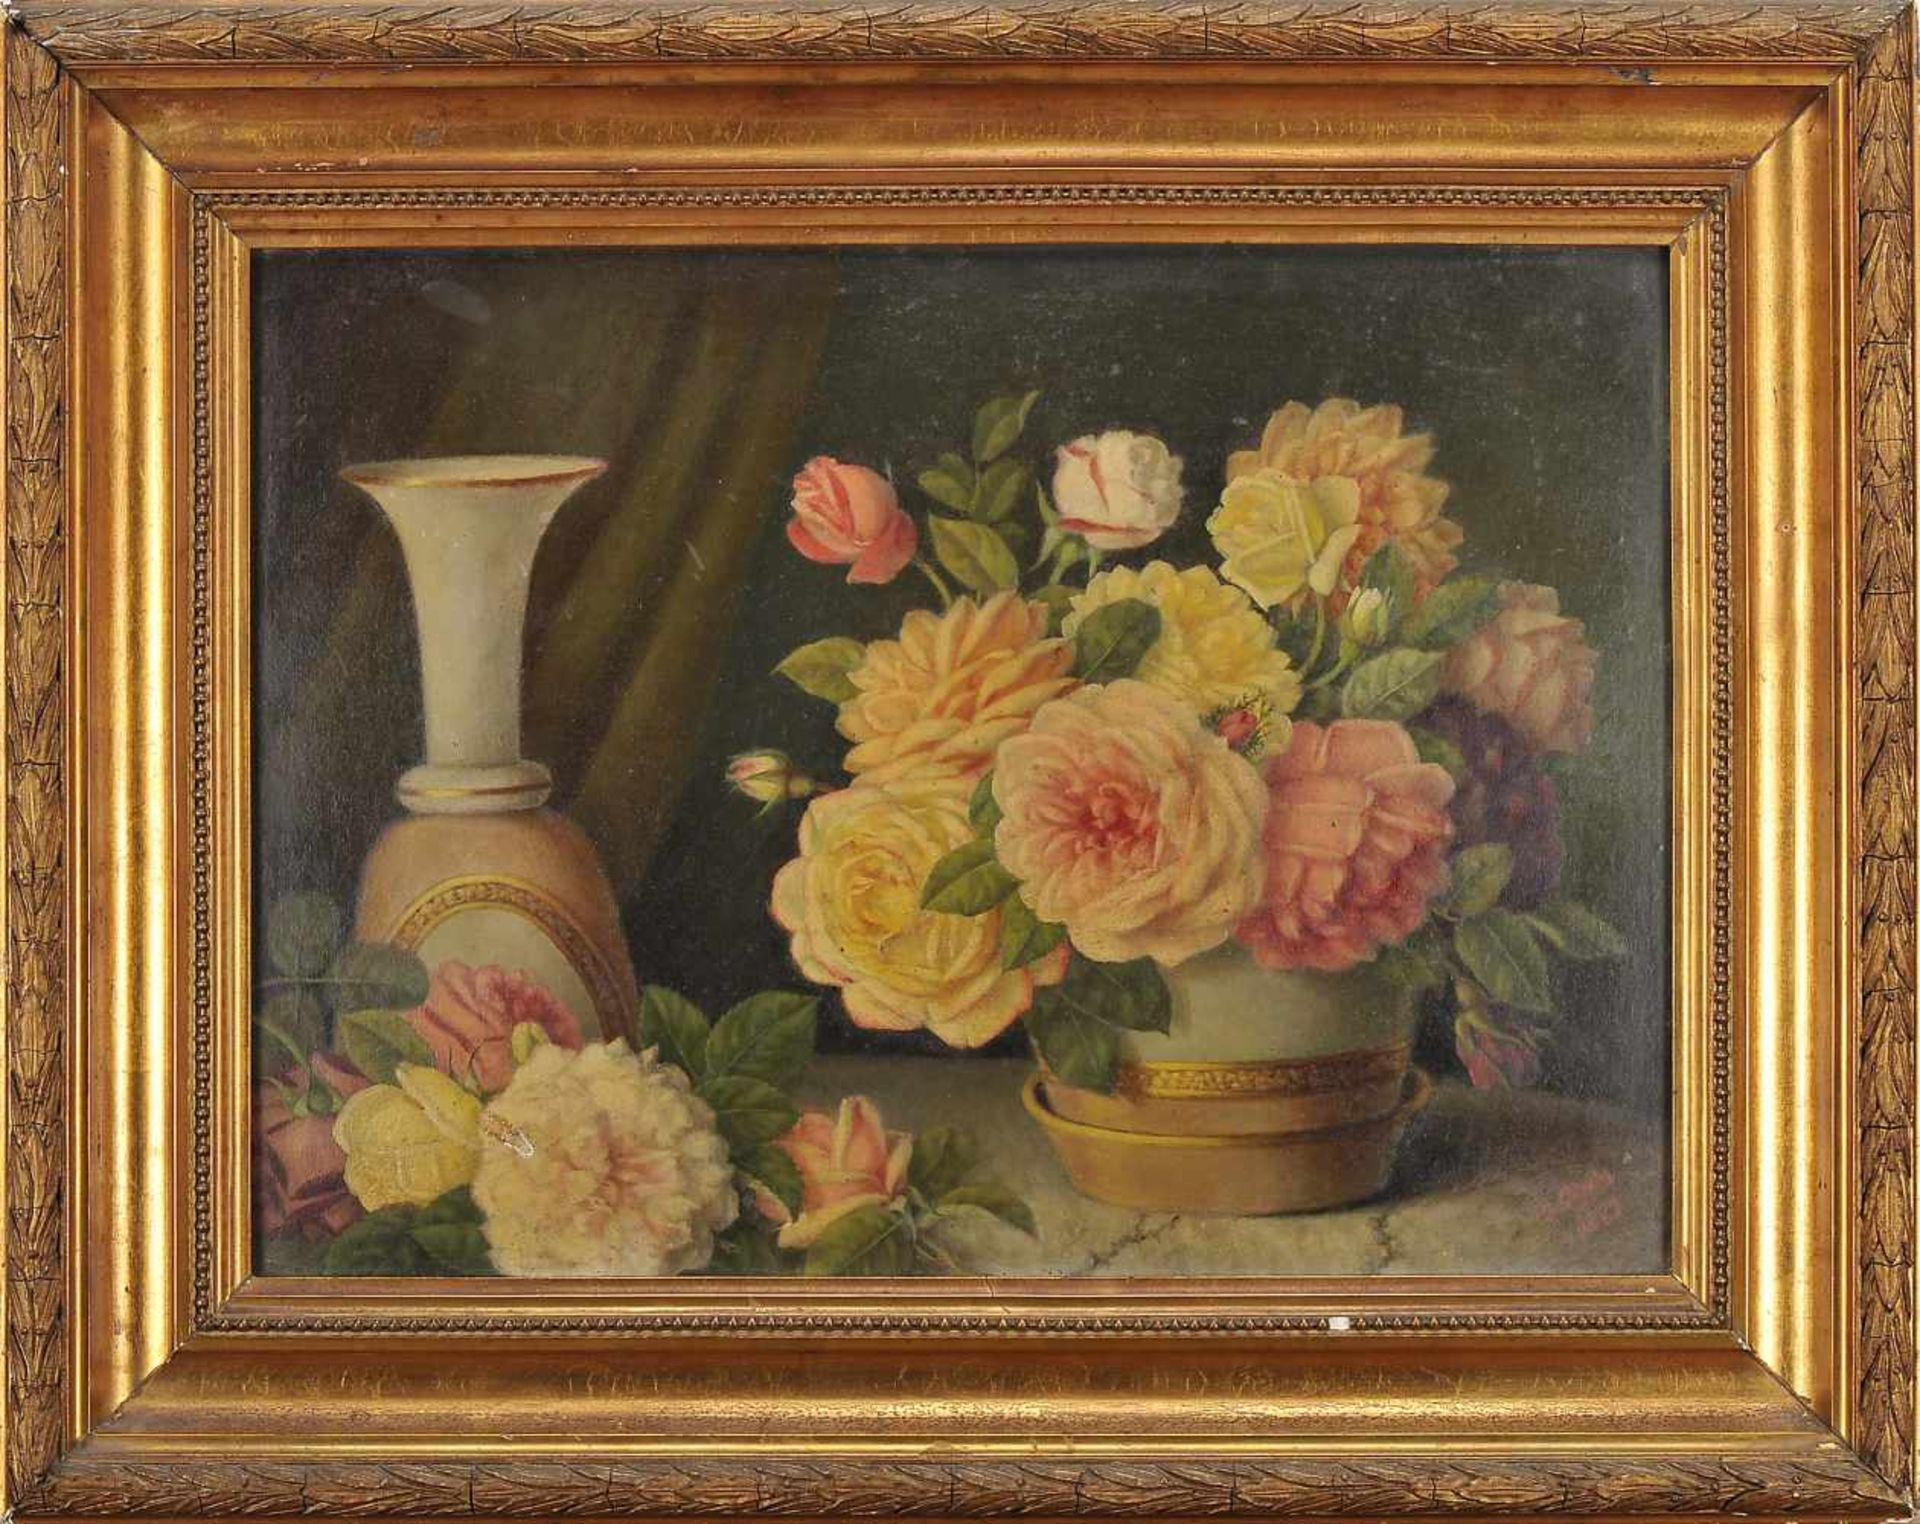 Los 90 - Still life - FlowersANTÓNIO JOSÉ DA COSTA - 1840-1929, Still life - Flowers, oil on cardboard,...